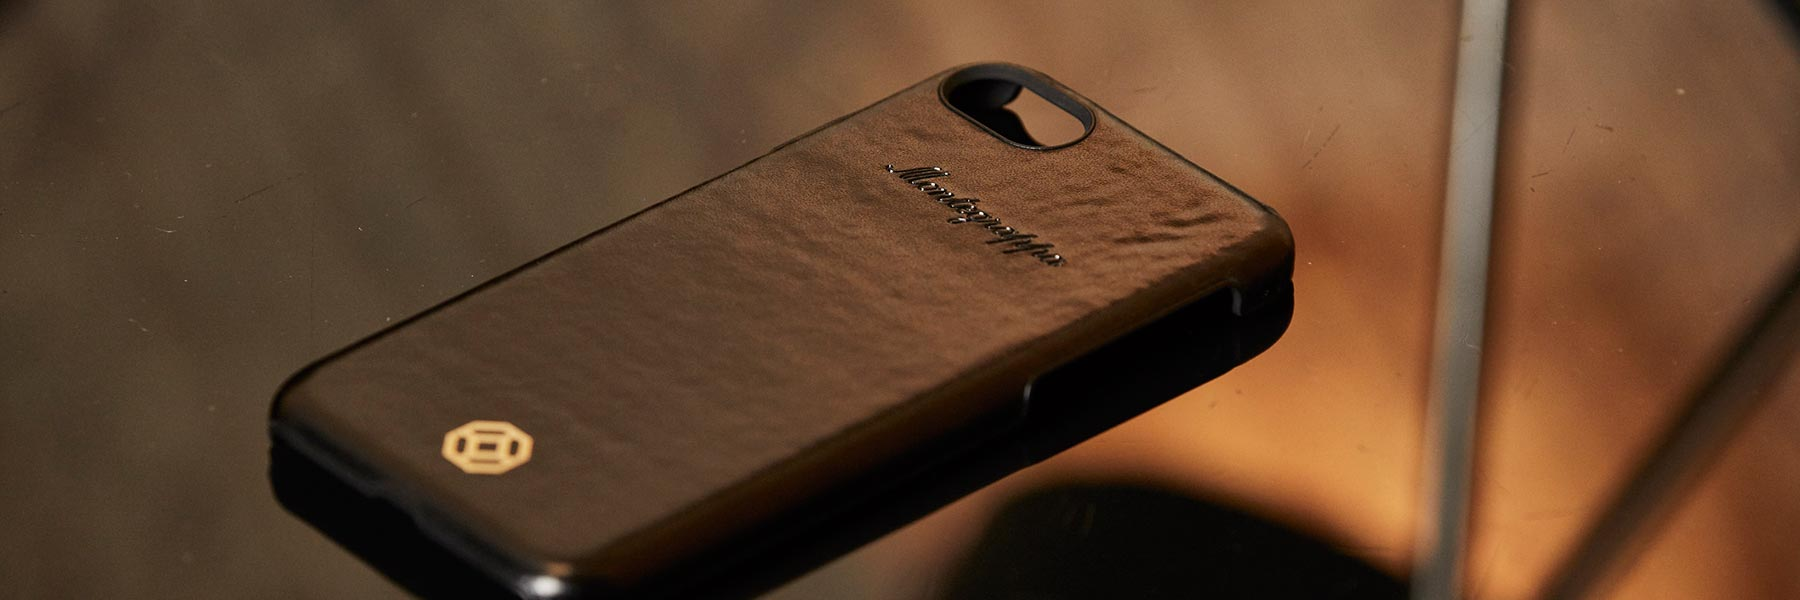 Bespoke Textiles phone case merchandise